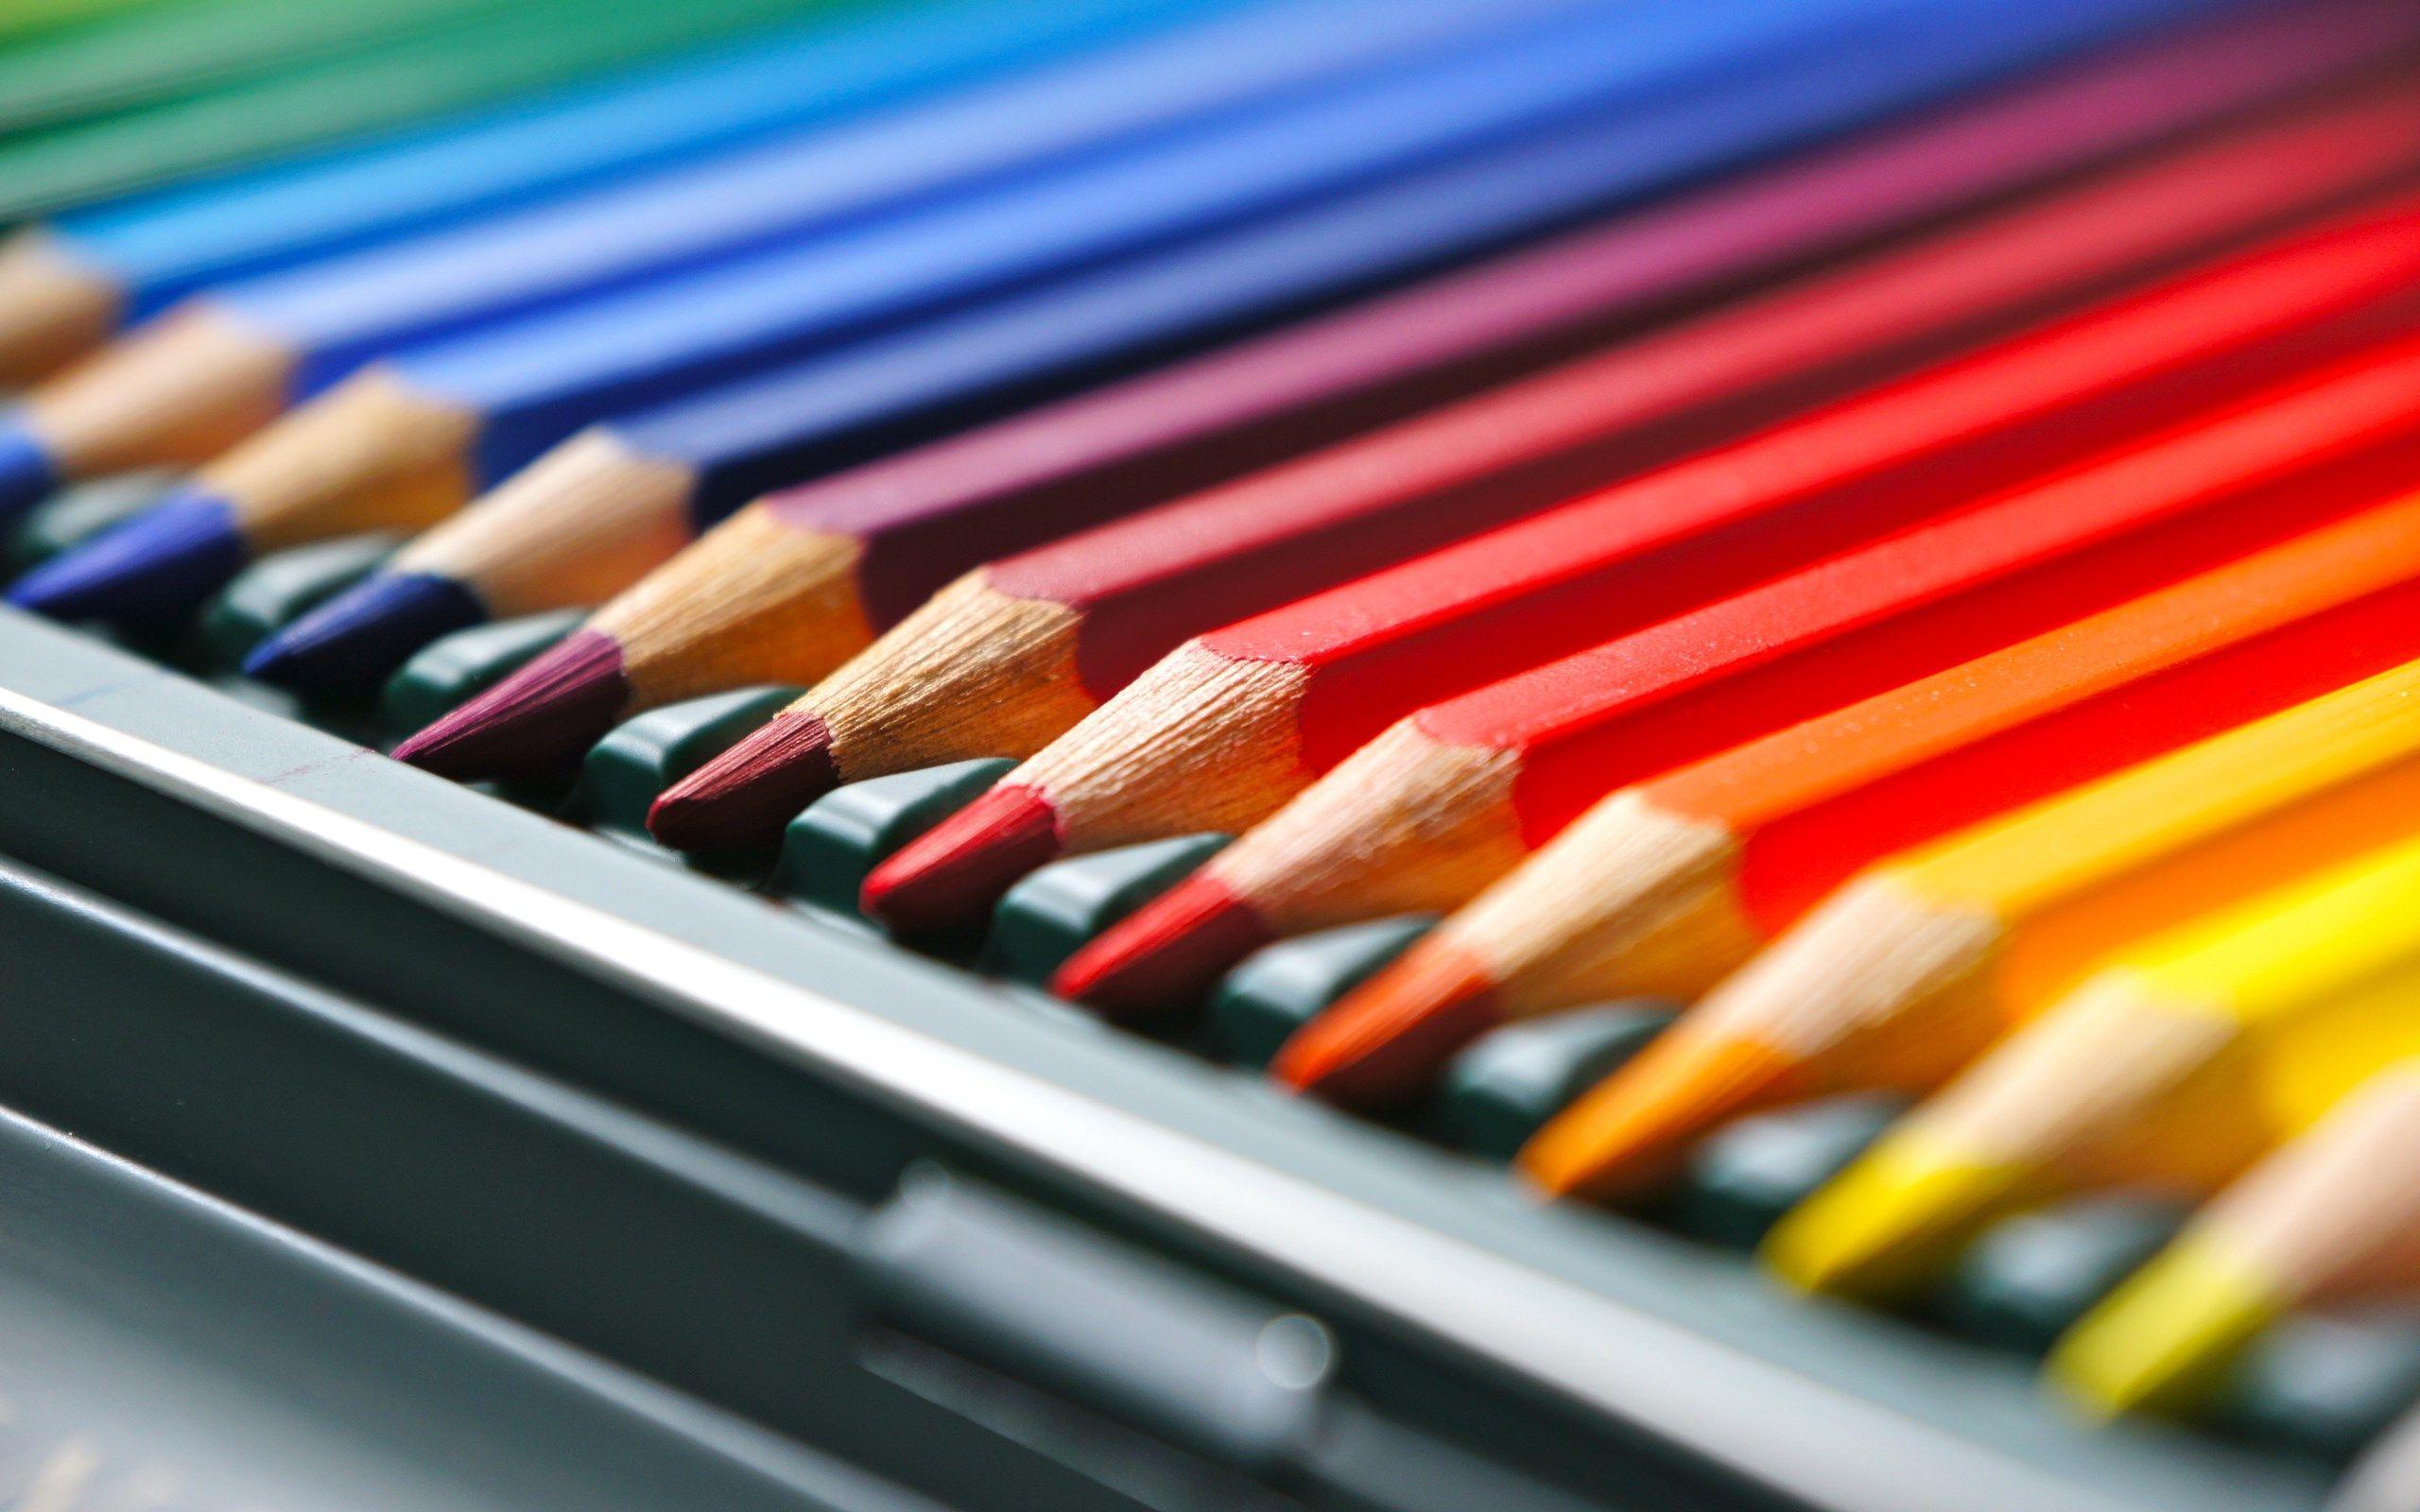 Colorful Drawing Pencils Set Hd Wallpaper Background Uhd 2k 4k 5k